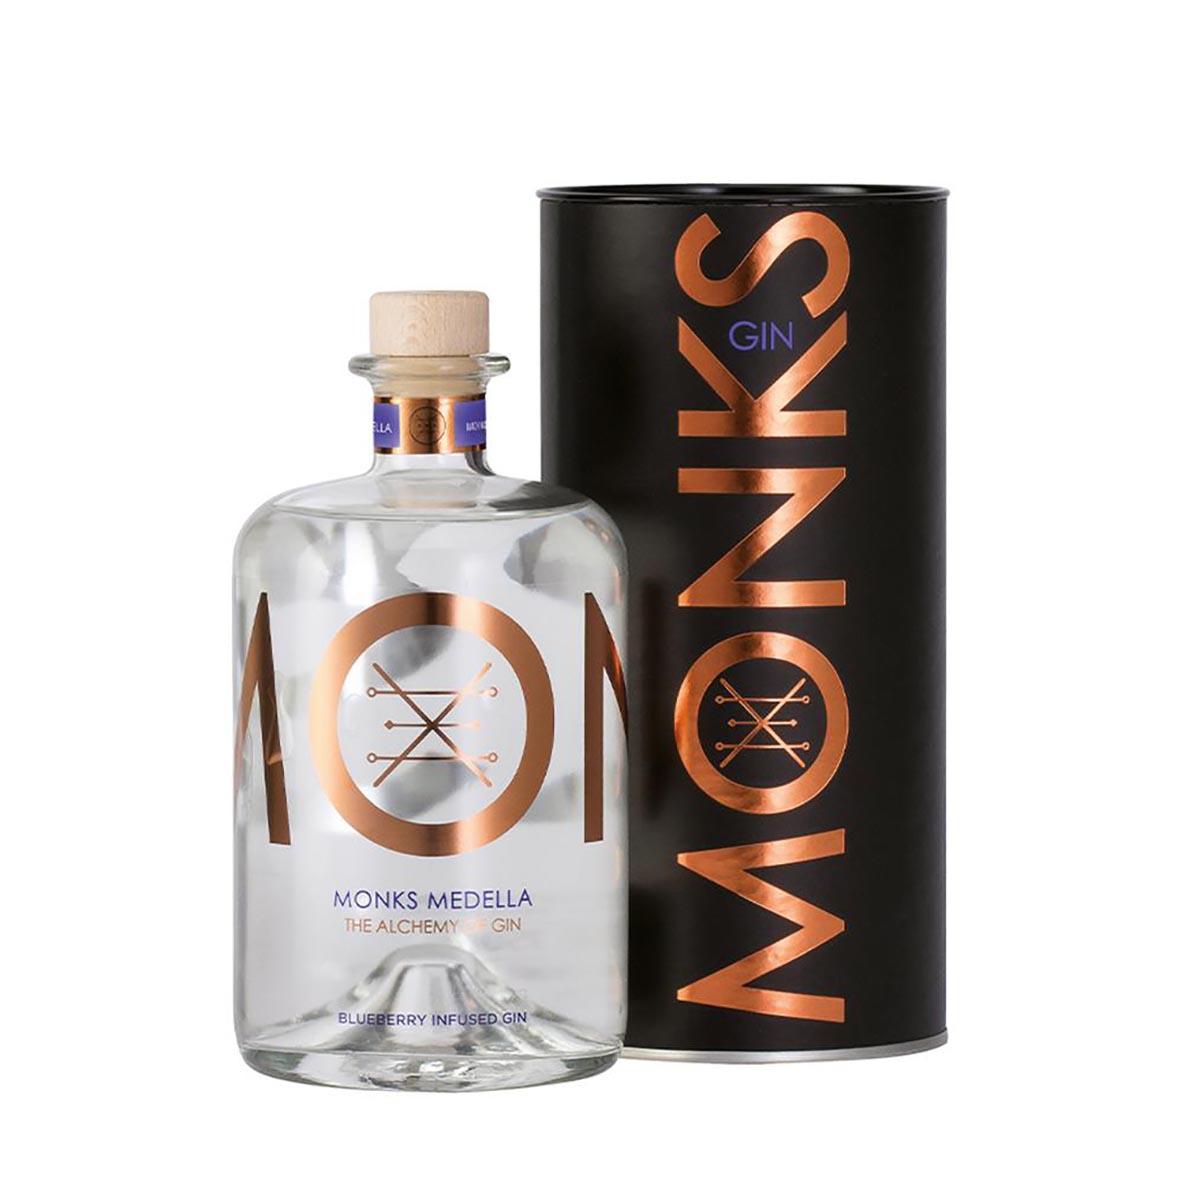 Monks Medella Gin